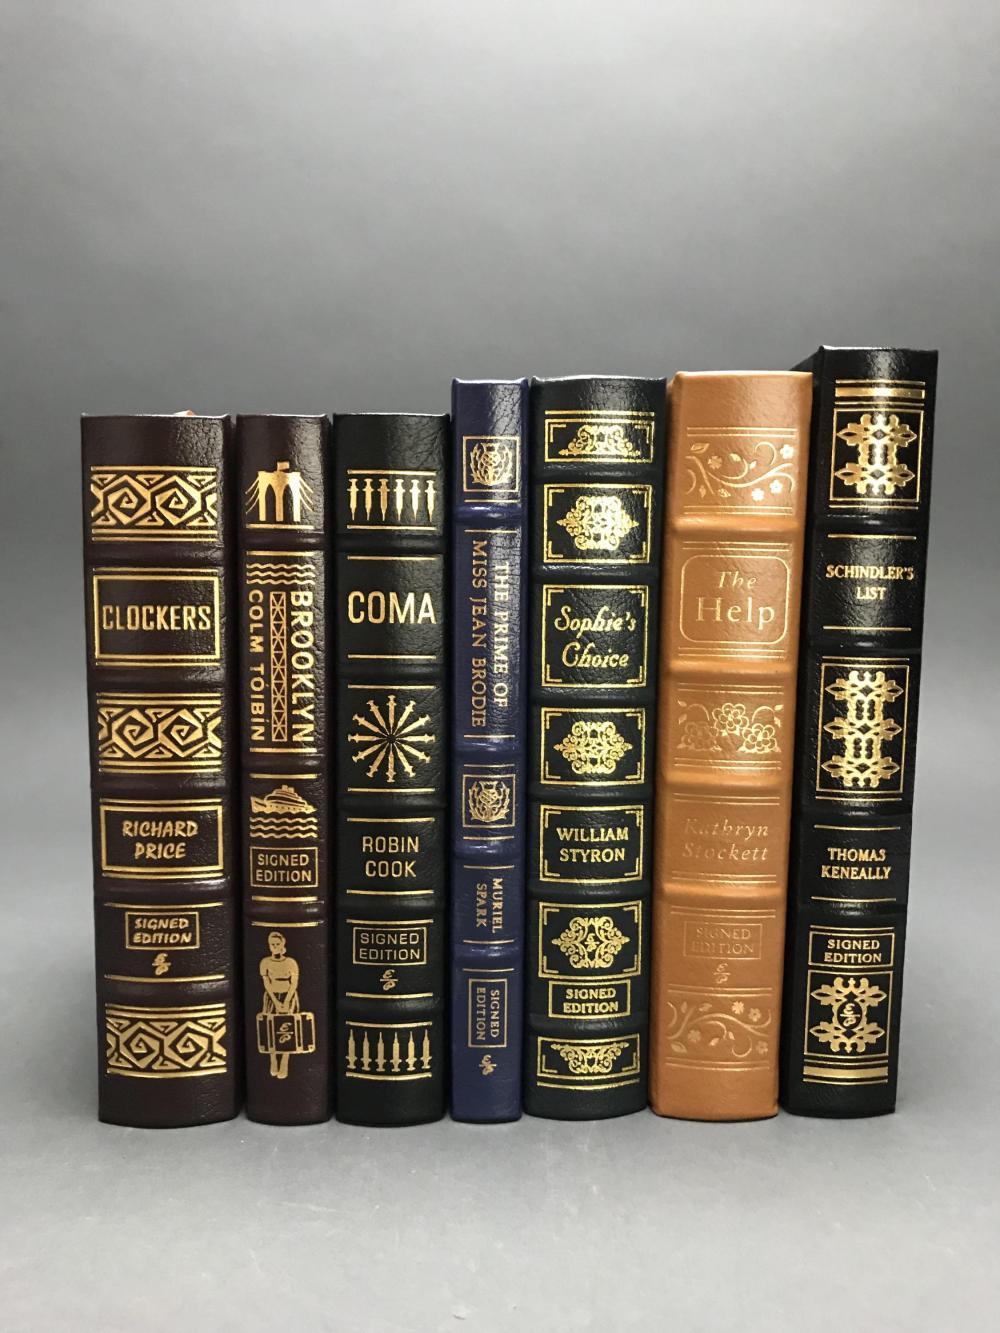 7 vols. Easton. Sgd. Books w/ film adaptations.